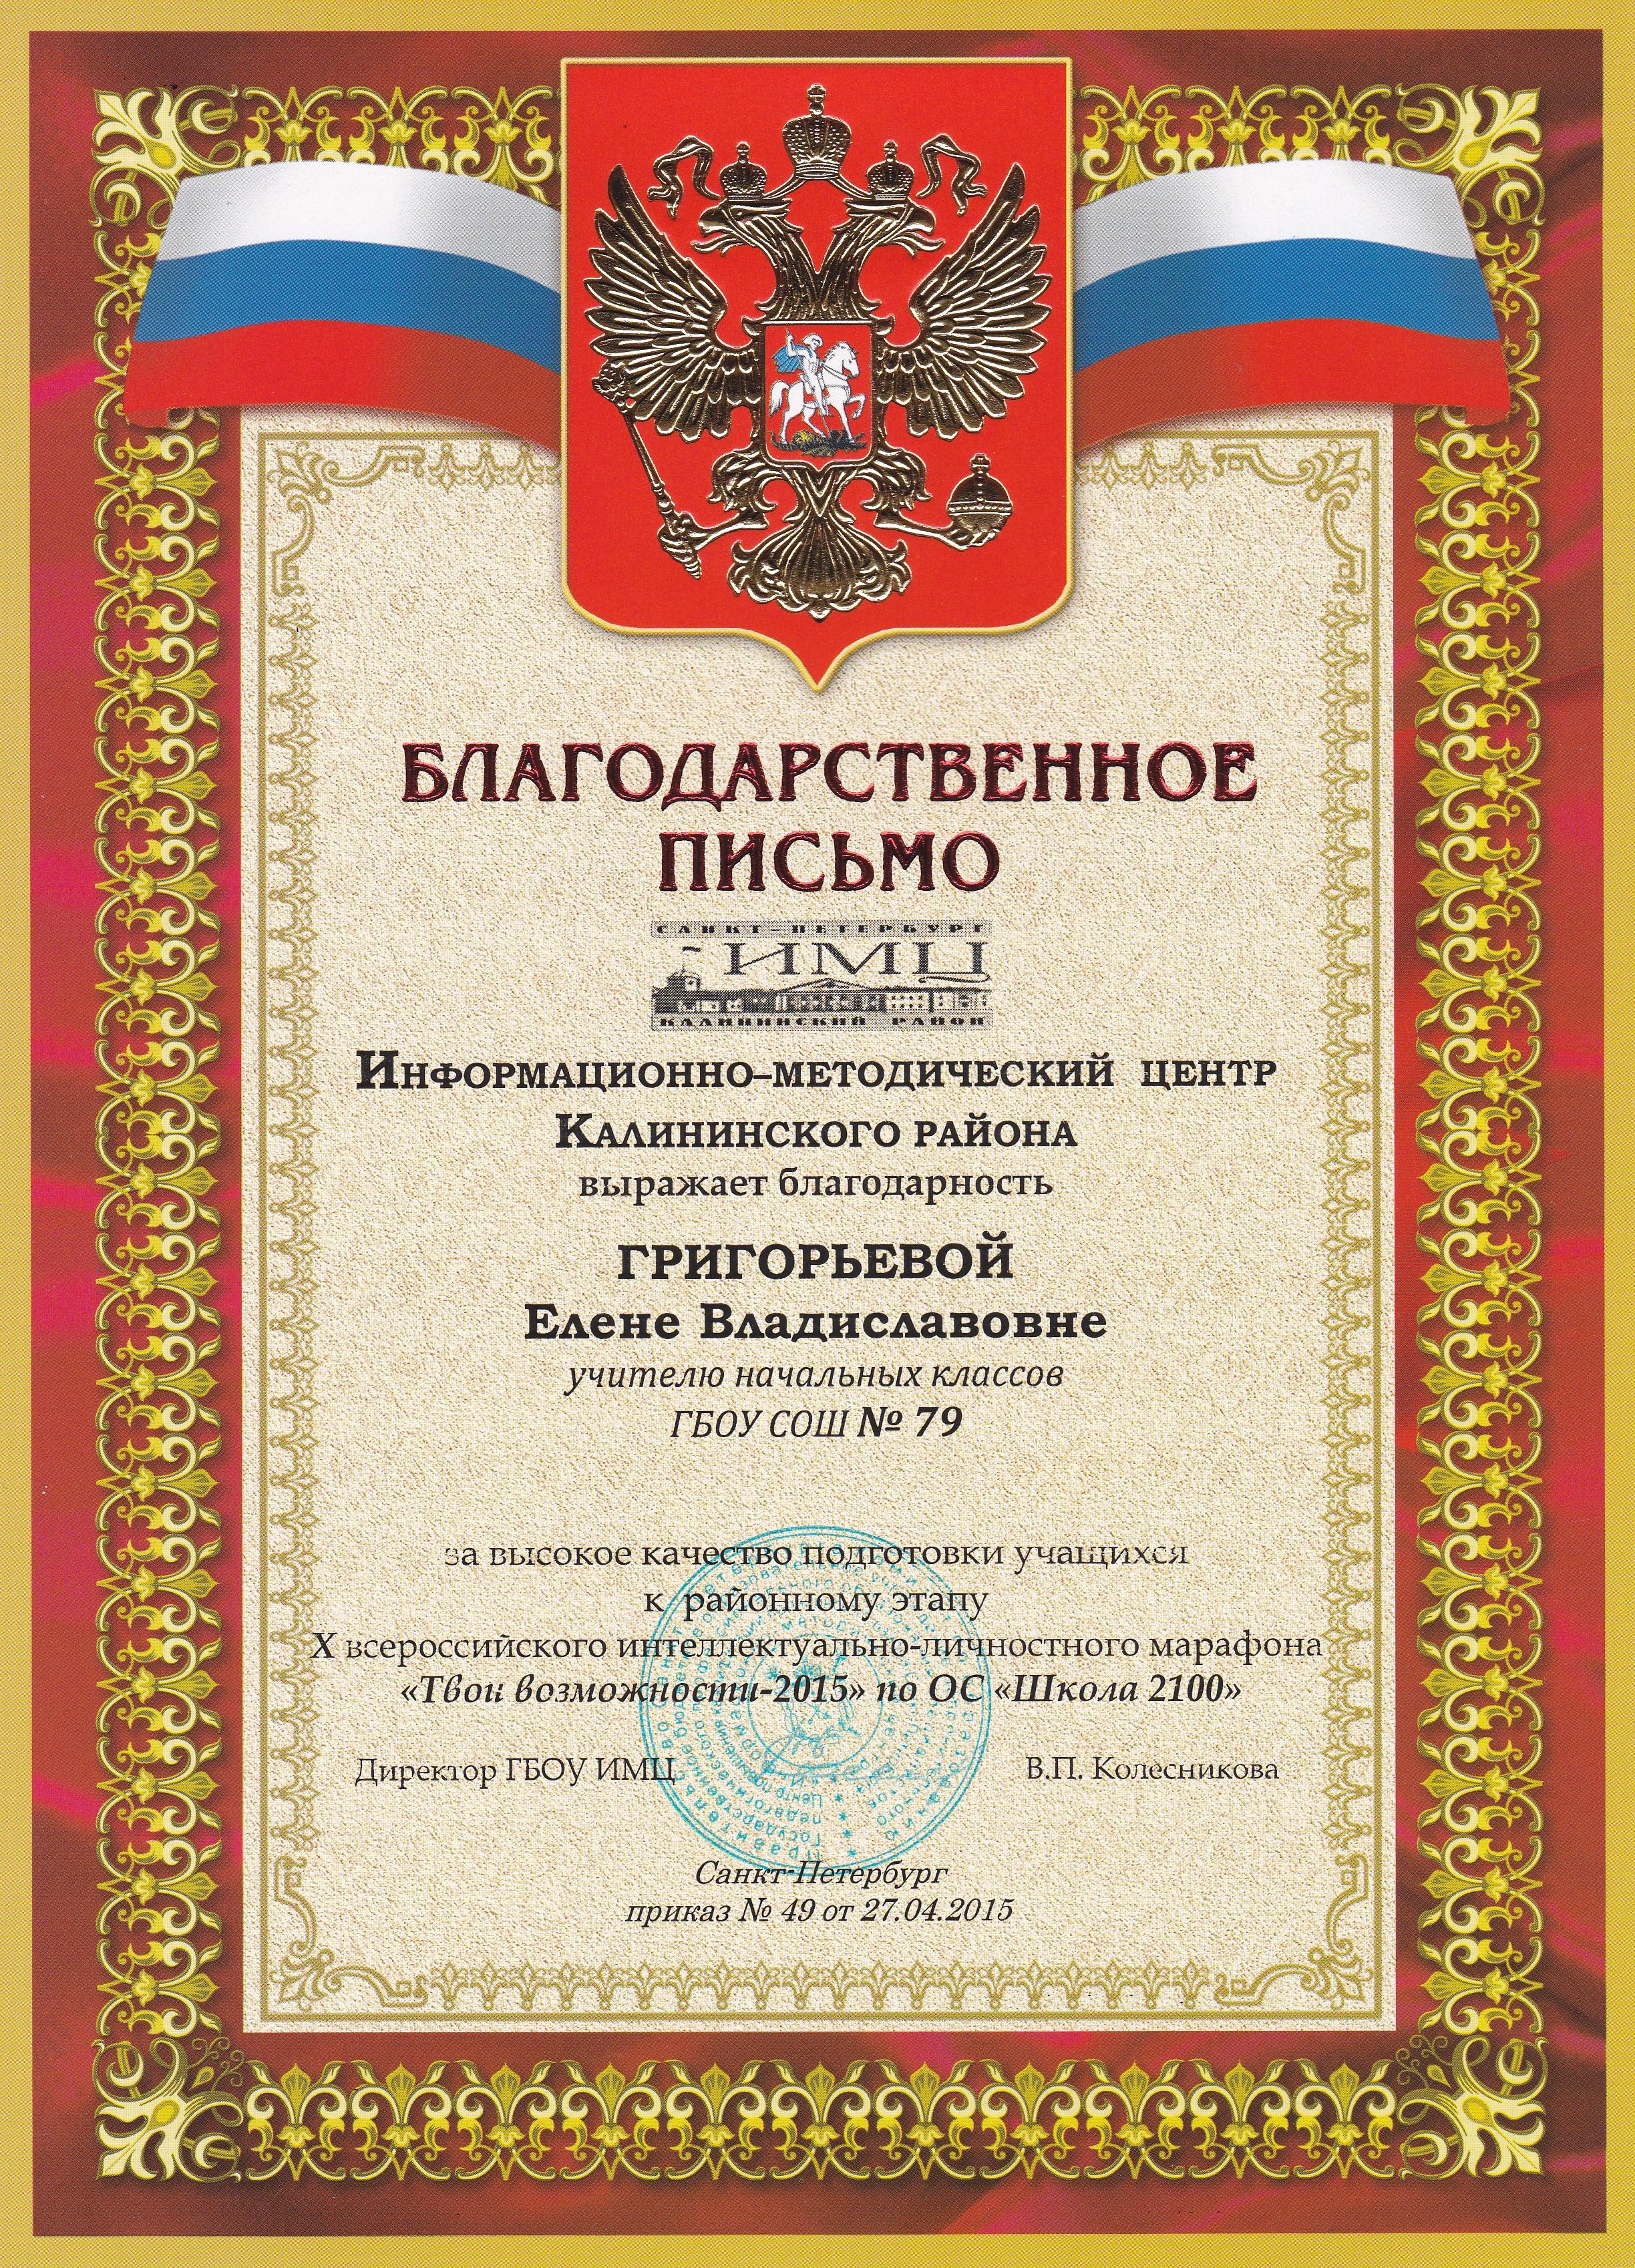 2015_1433756077_grigorieva_27_04_15